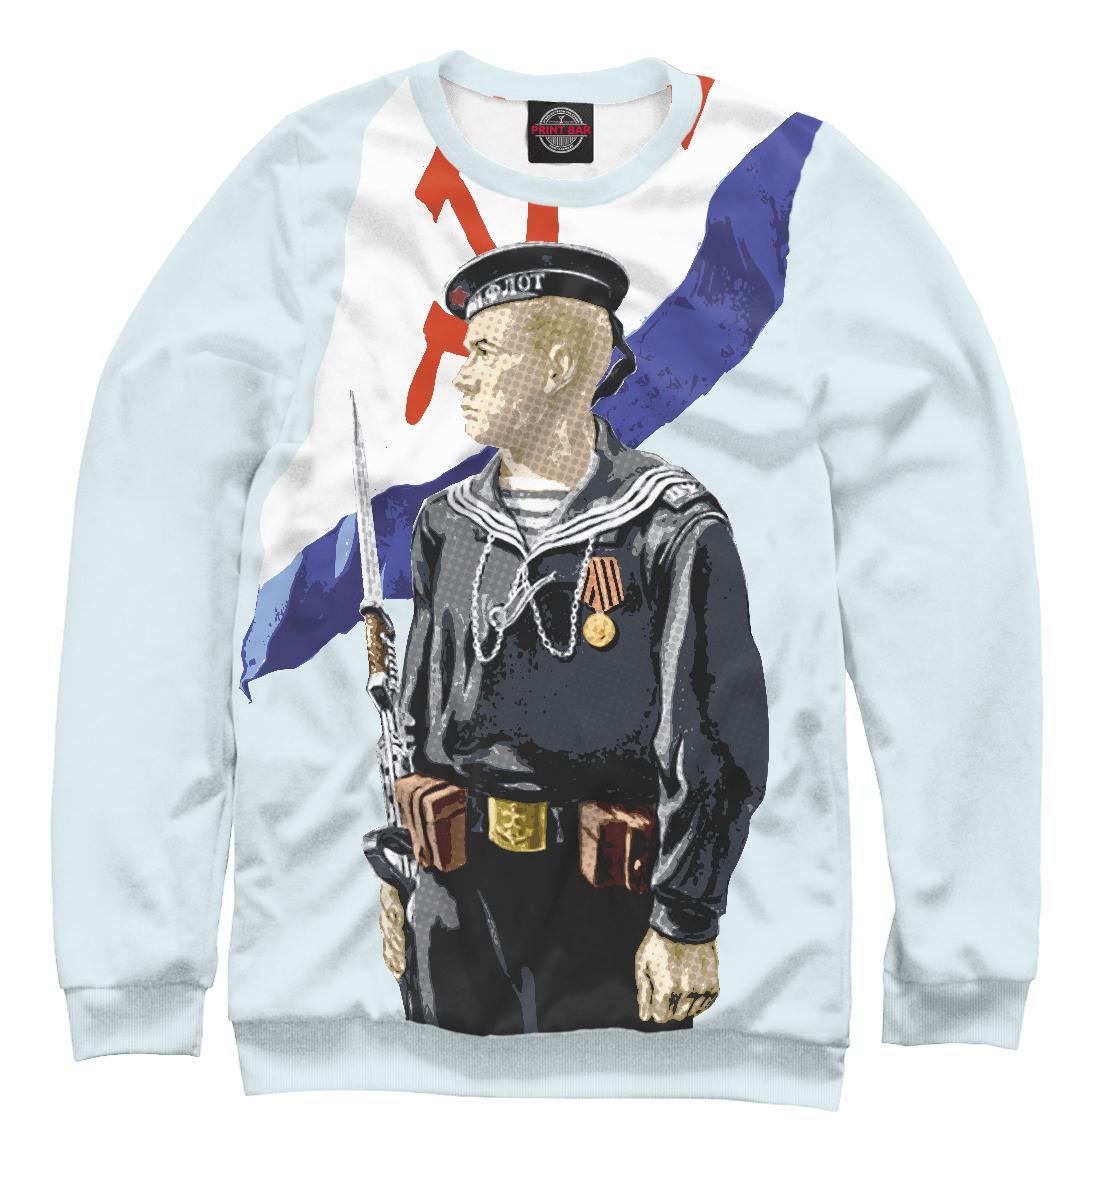 Купить ВМФ - Рулит!, Printbar, Свитшоты, VMF-377186-swi-2